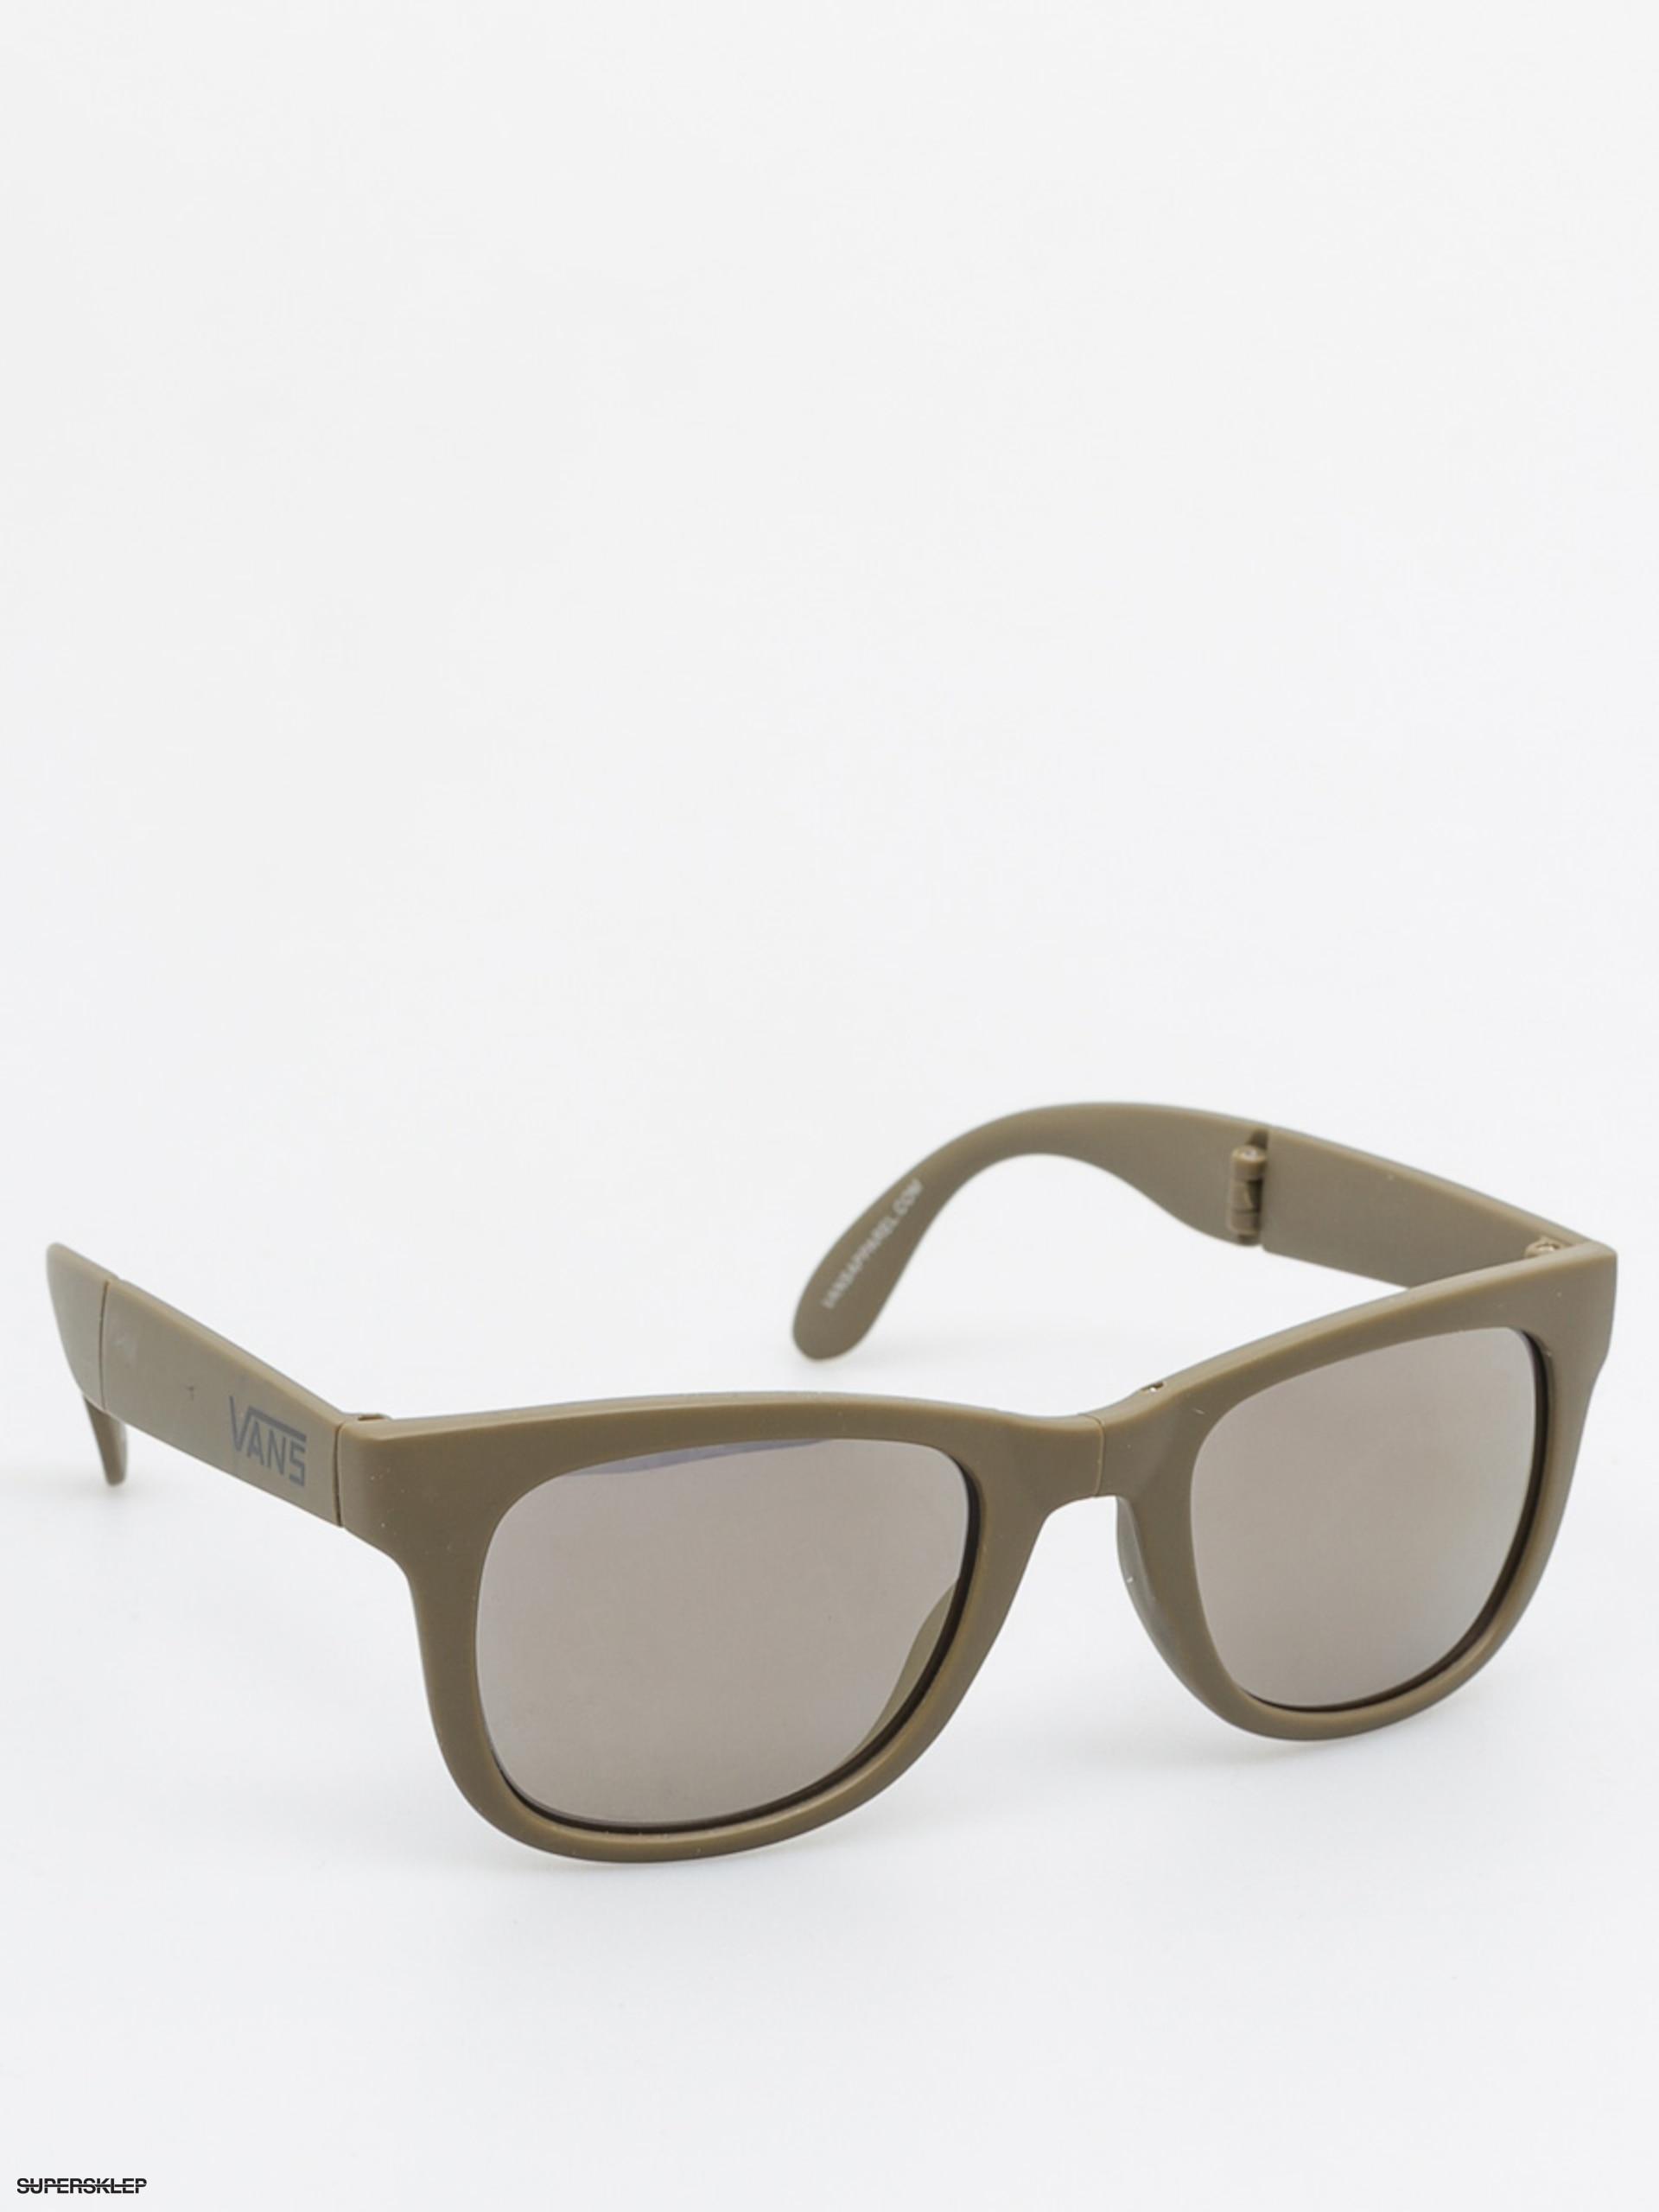 db3325dff Slnečné okuliare Vans Foldable Spicoli Shades (guacamole)